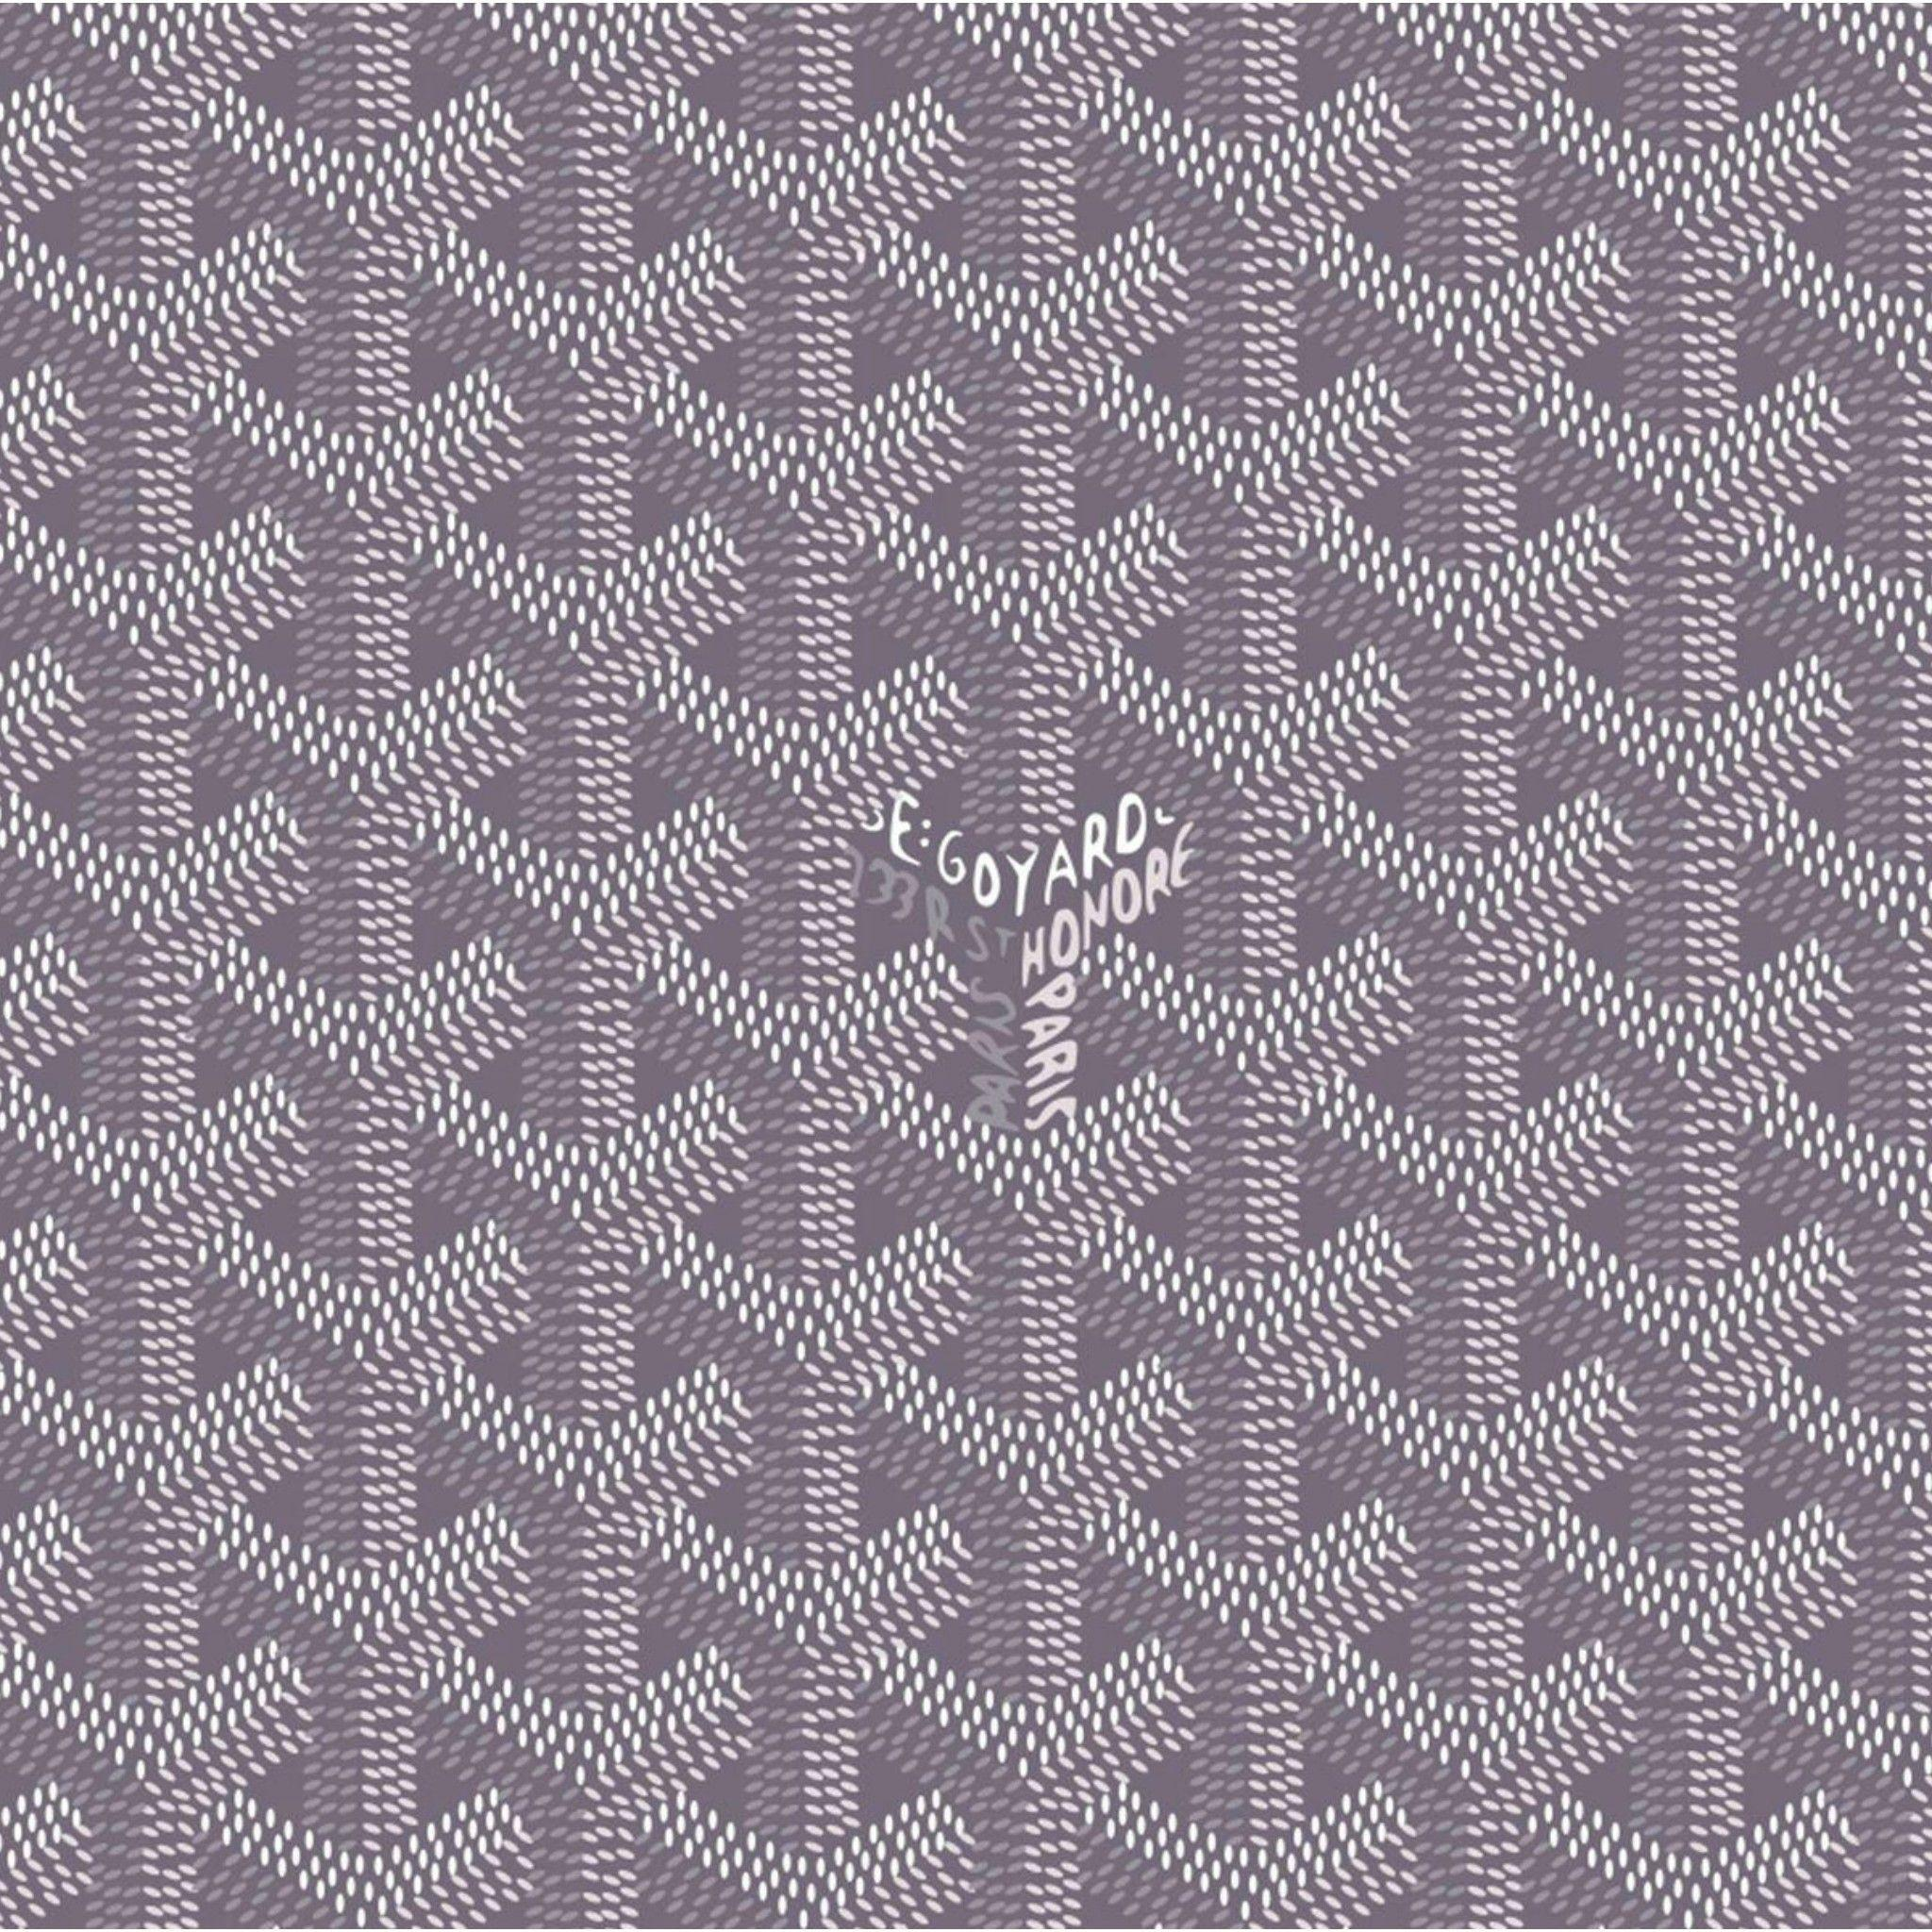 Goyard Design - Tap to see more goyard wallpapers! - @mobile9 | iPad .